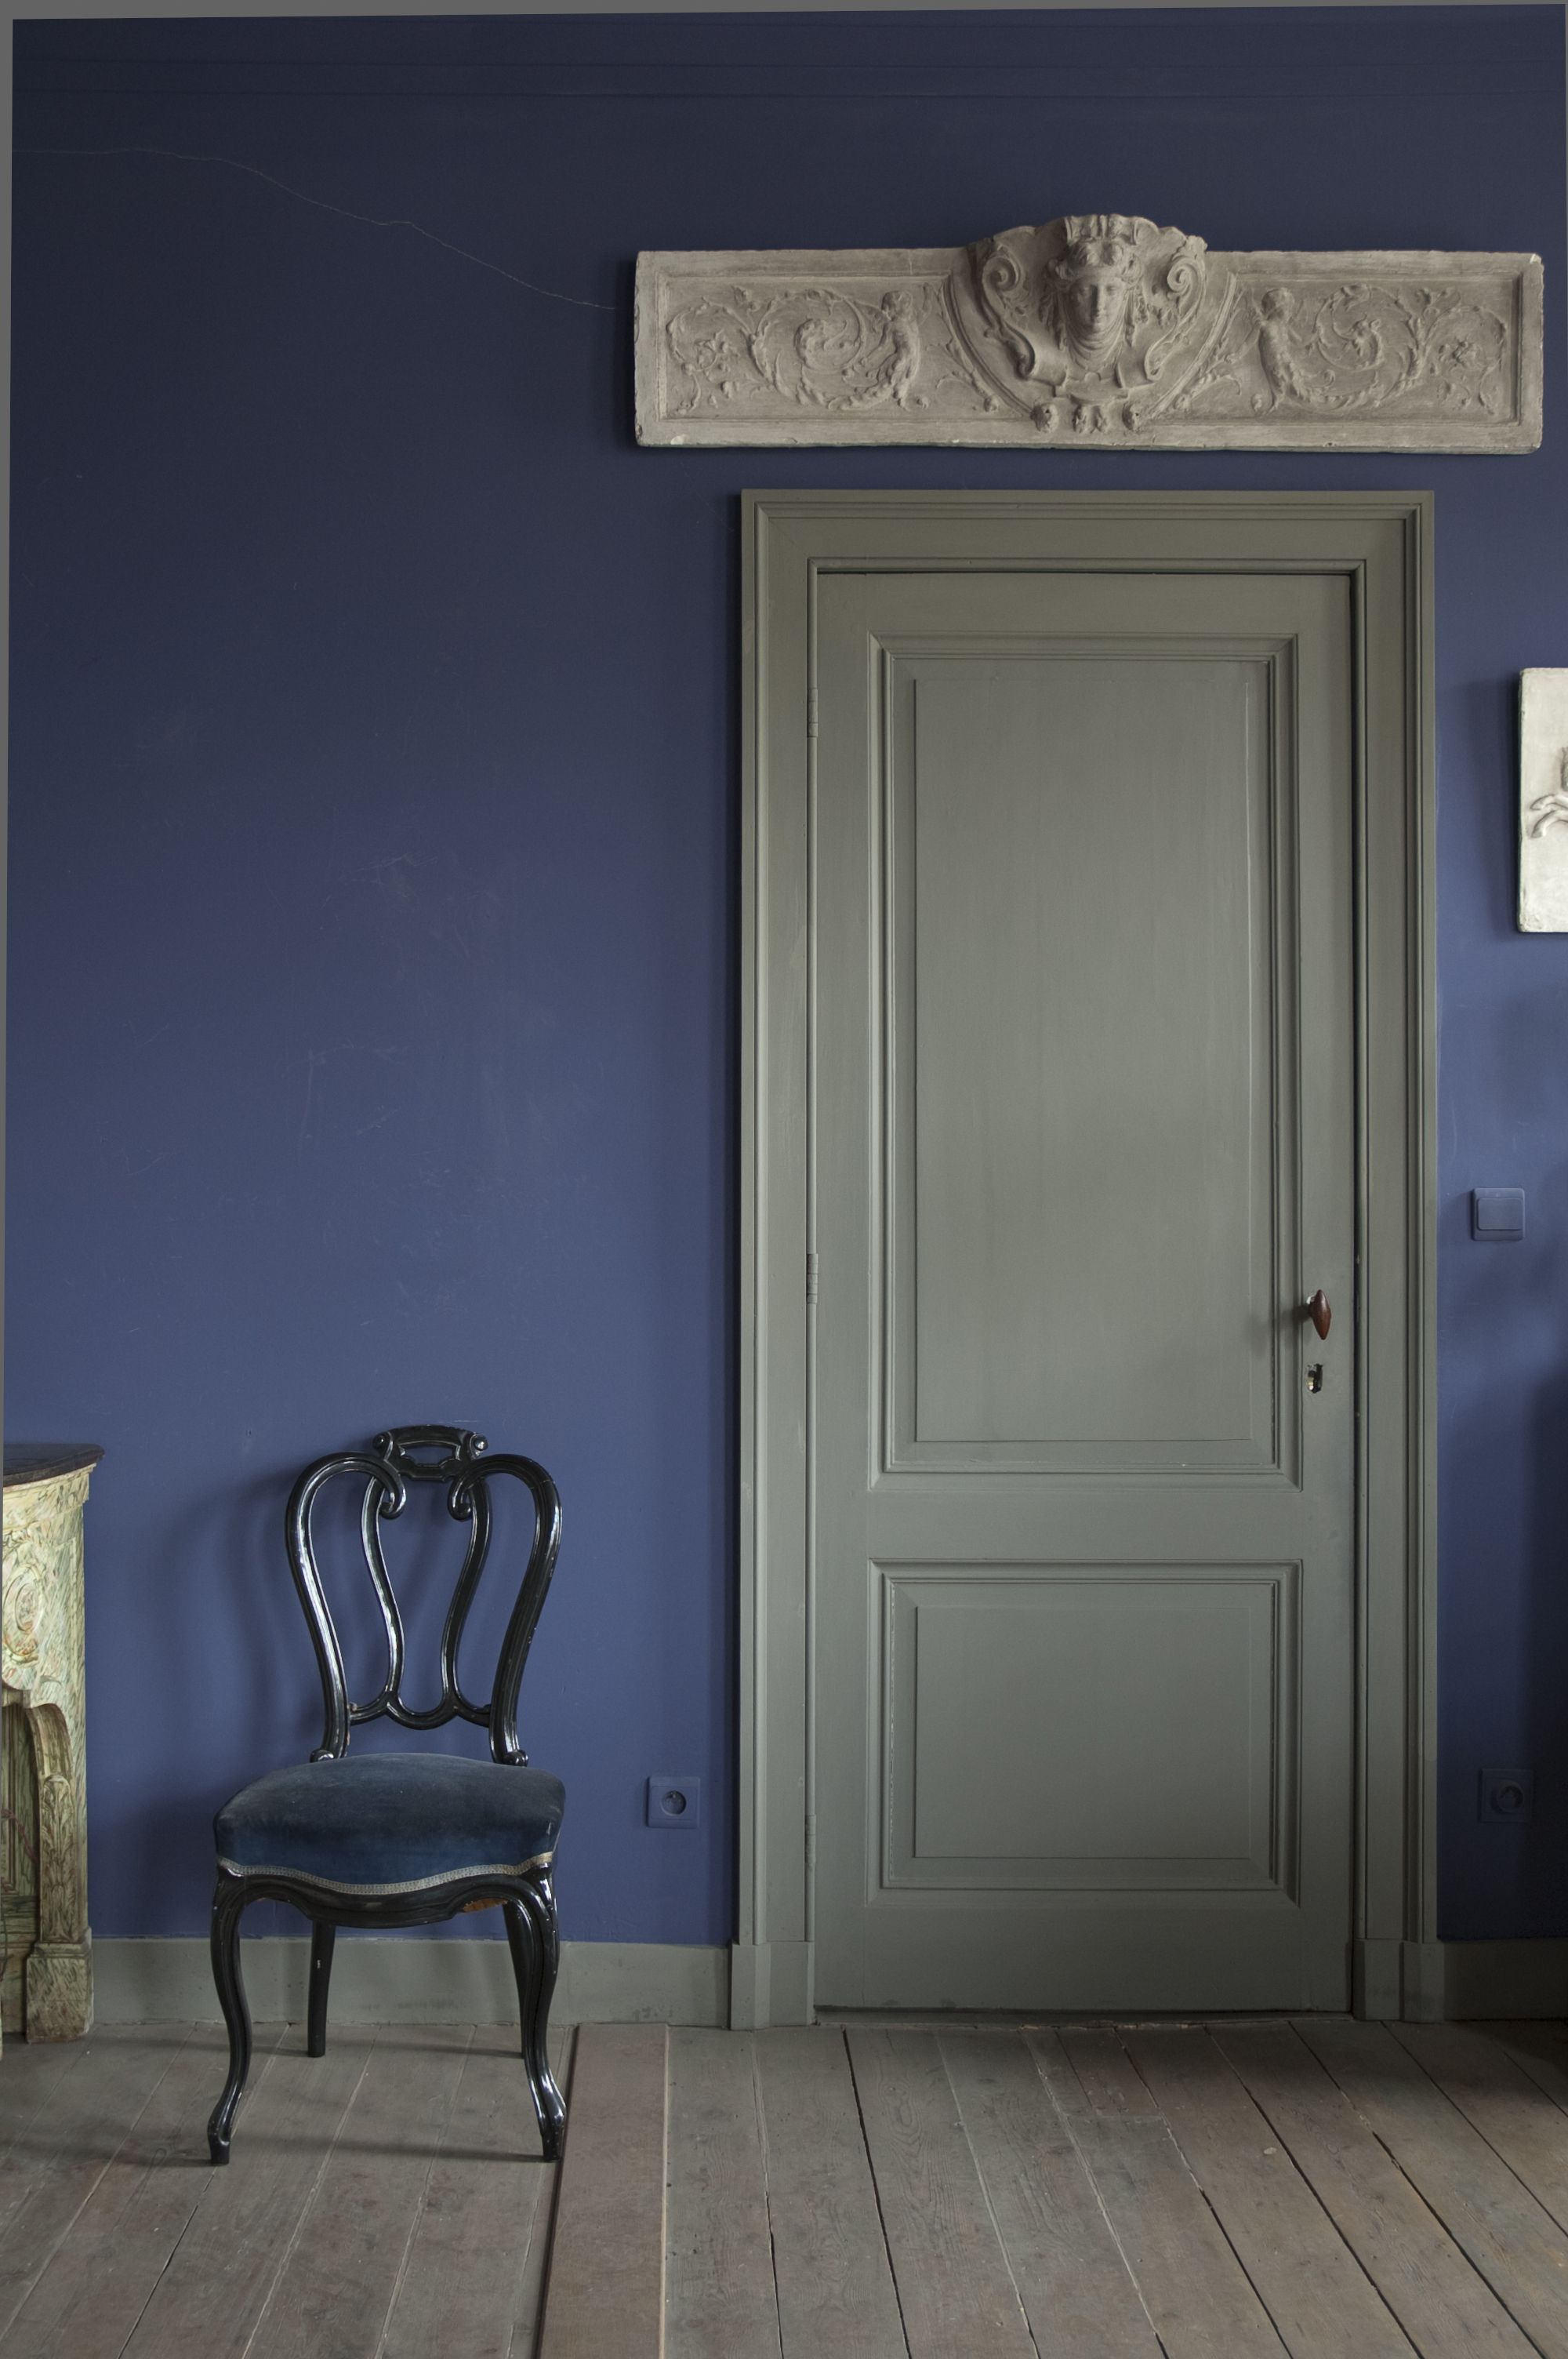 Tolle Farben Wand, Tür, Fußboden | colours and details | Pinterest ...